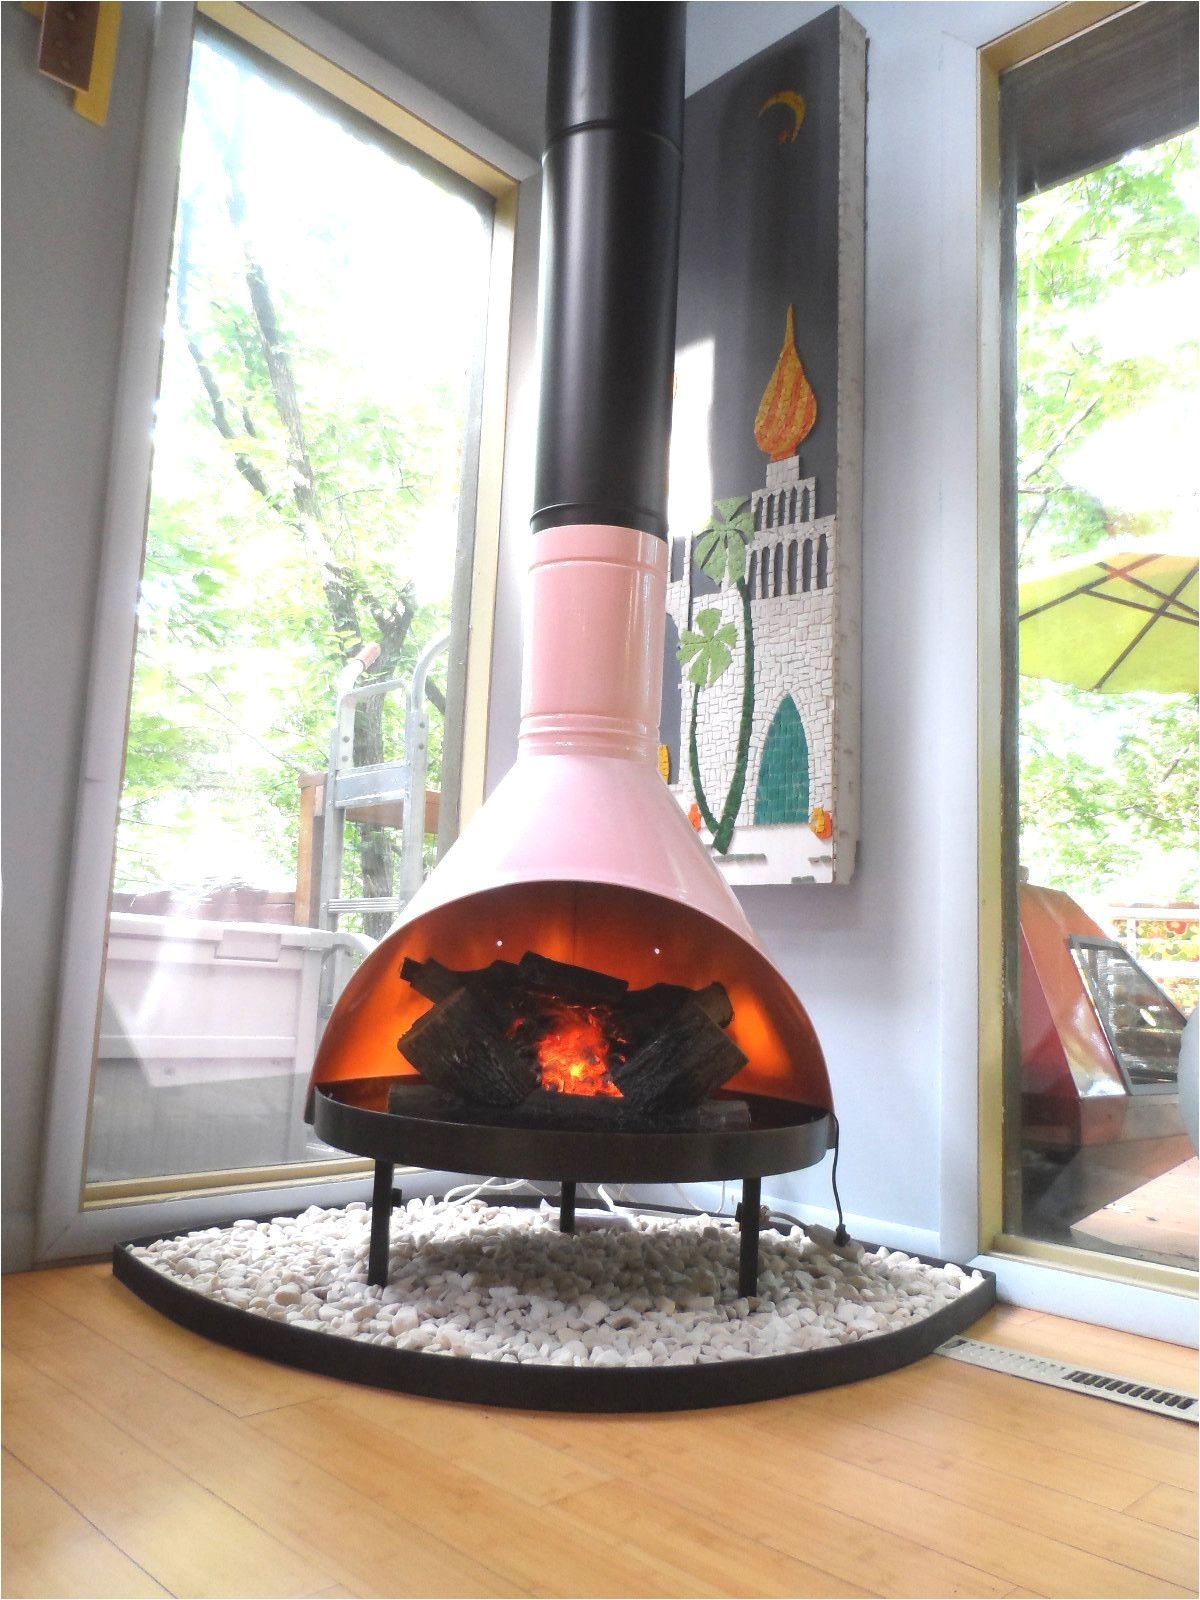 Preway Fireplace for Sale Retro Mid Century Mod Pink Black Preway Small Freestanding Cone